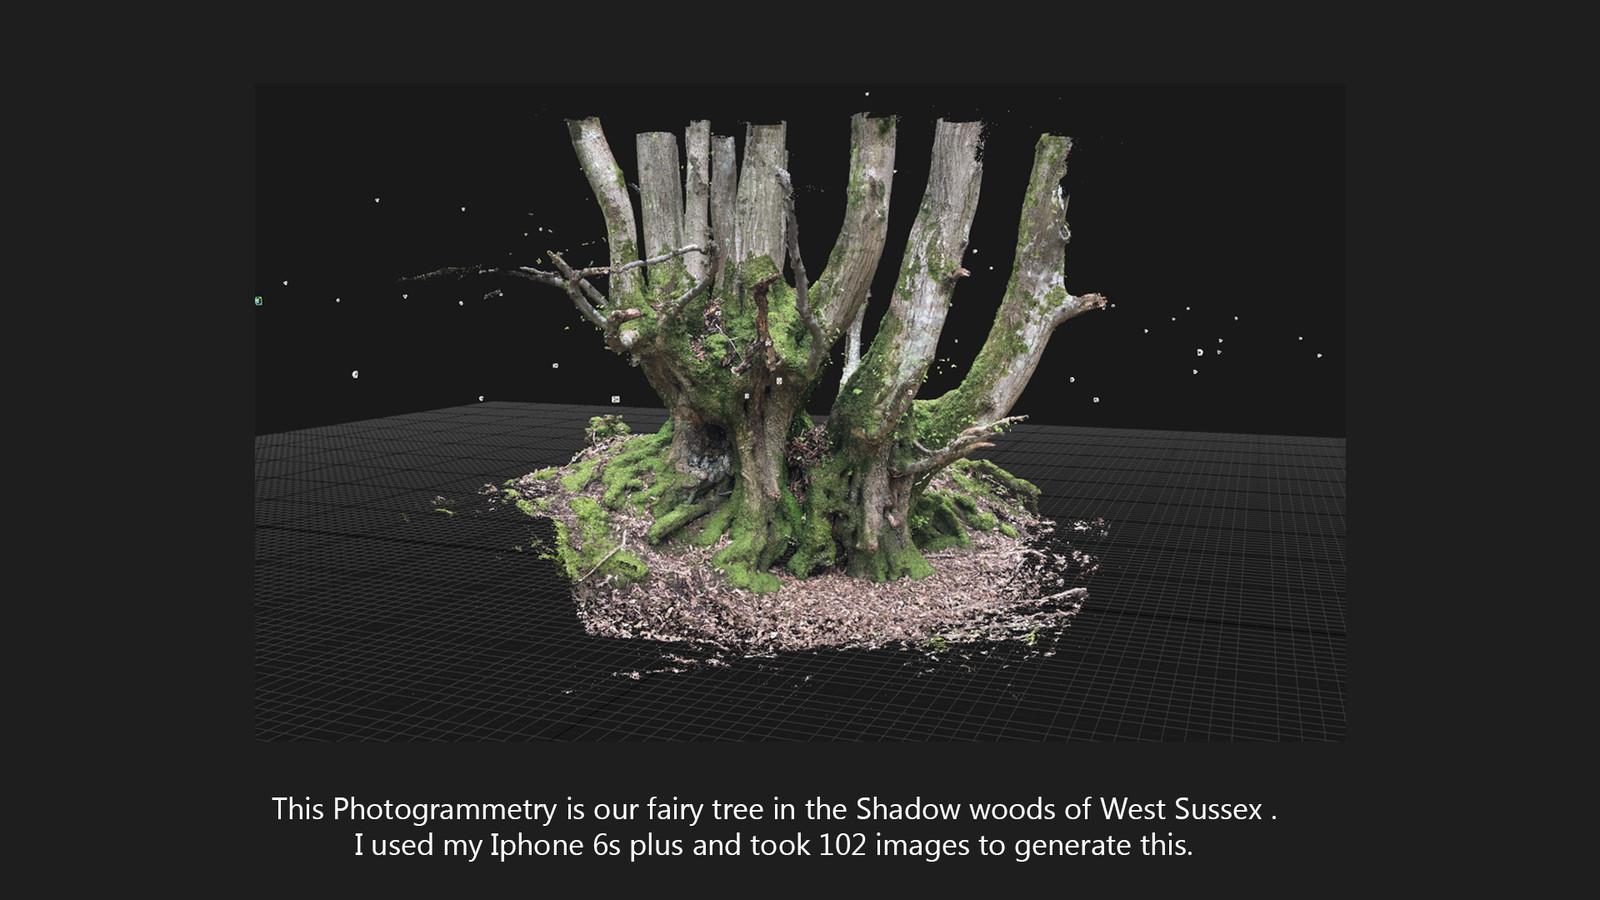 Fairy Tree shadow woods